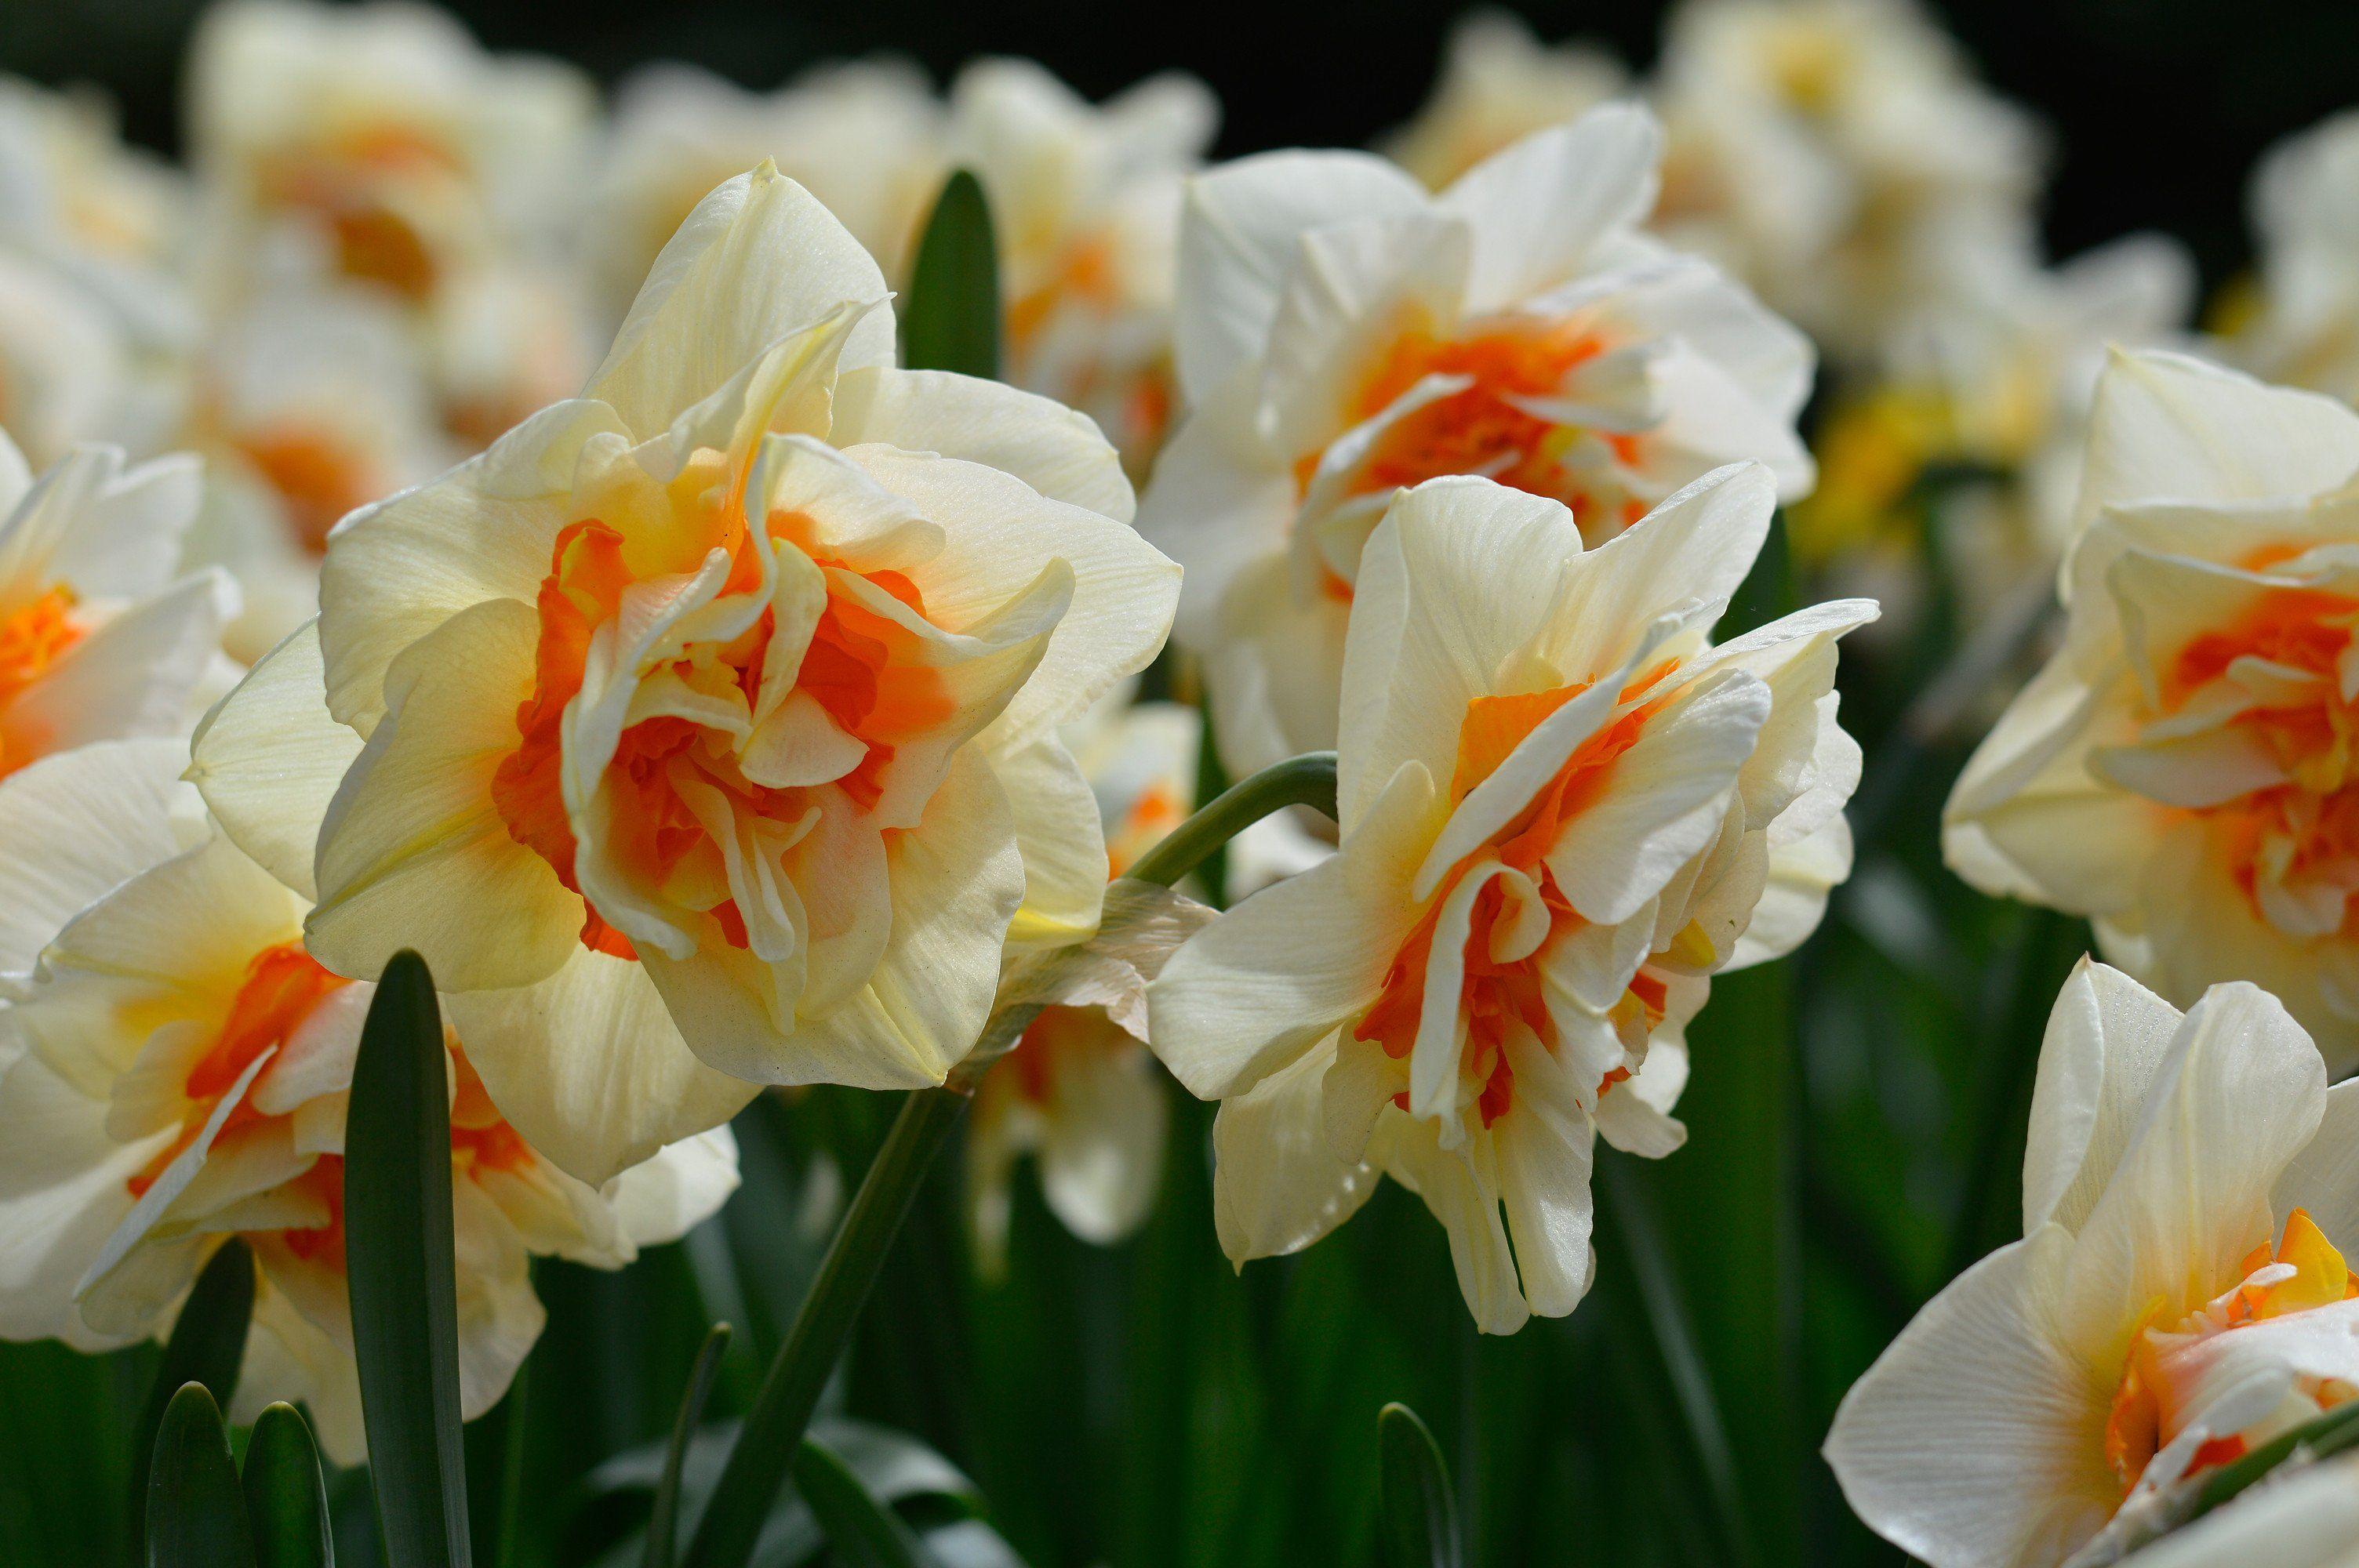 Daffodil Flower Parade Daffodil Flower Daffodils Flowers